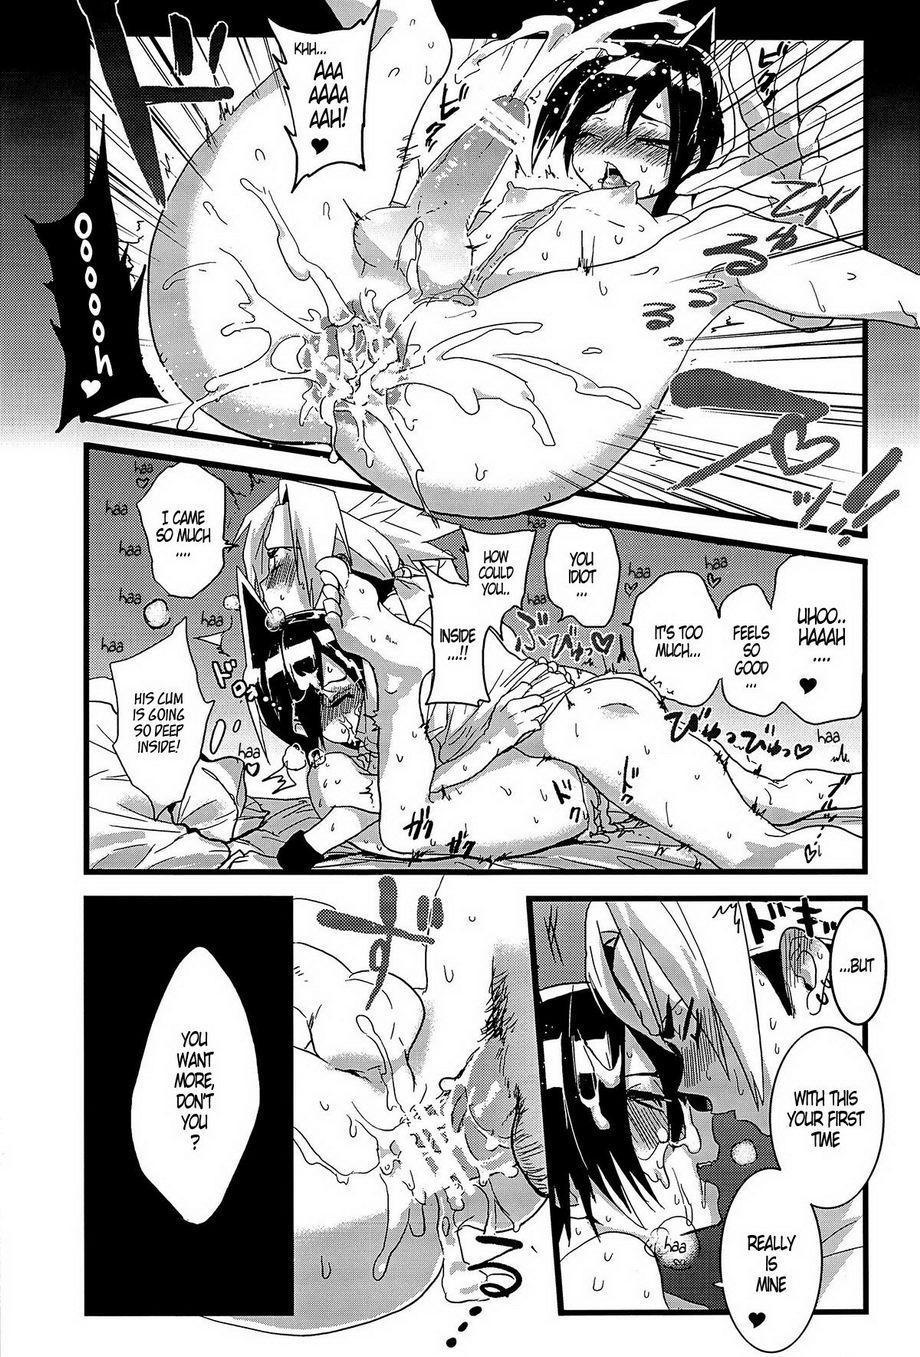 Kisama no Hajimete Ore no Mono! 14